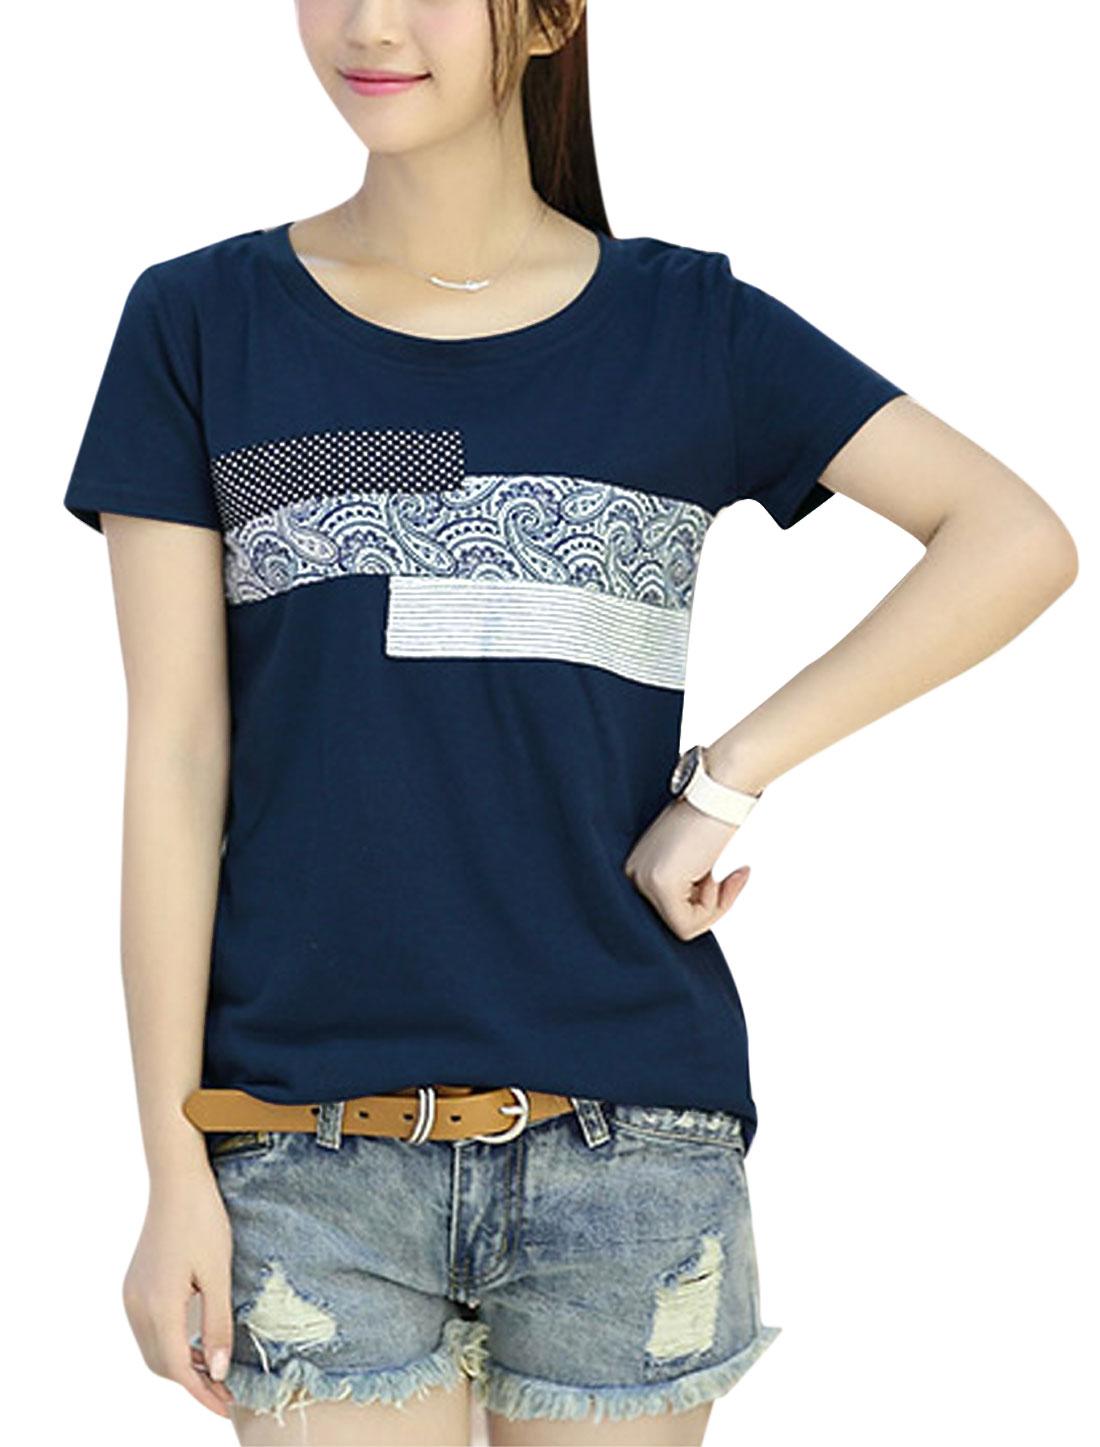 Ladies Paisleys Prints Panel Style T-Shirt Dark Sea Blue XS